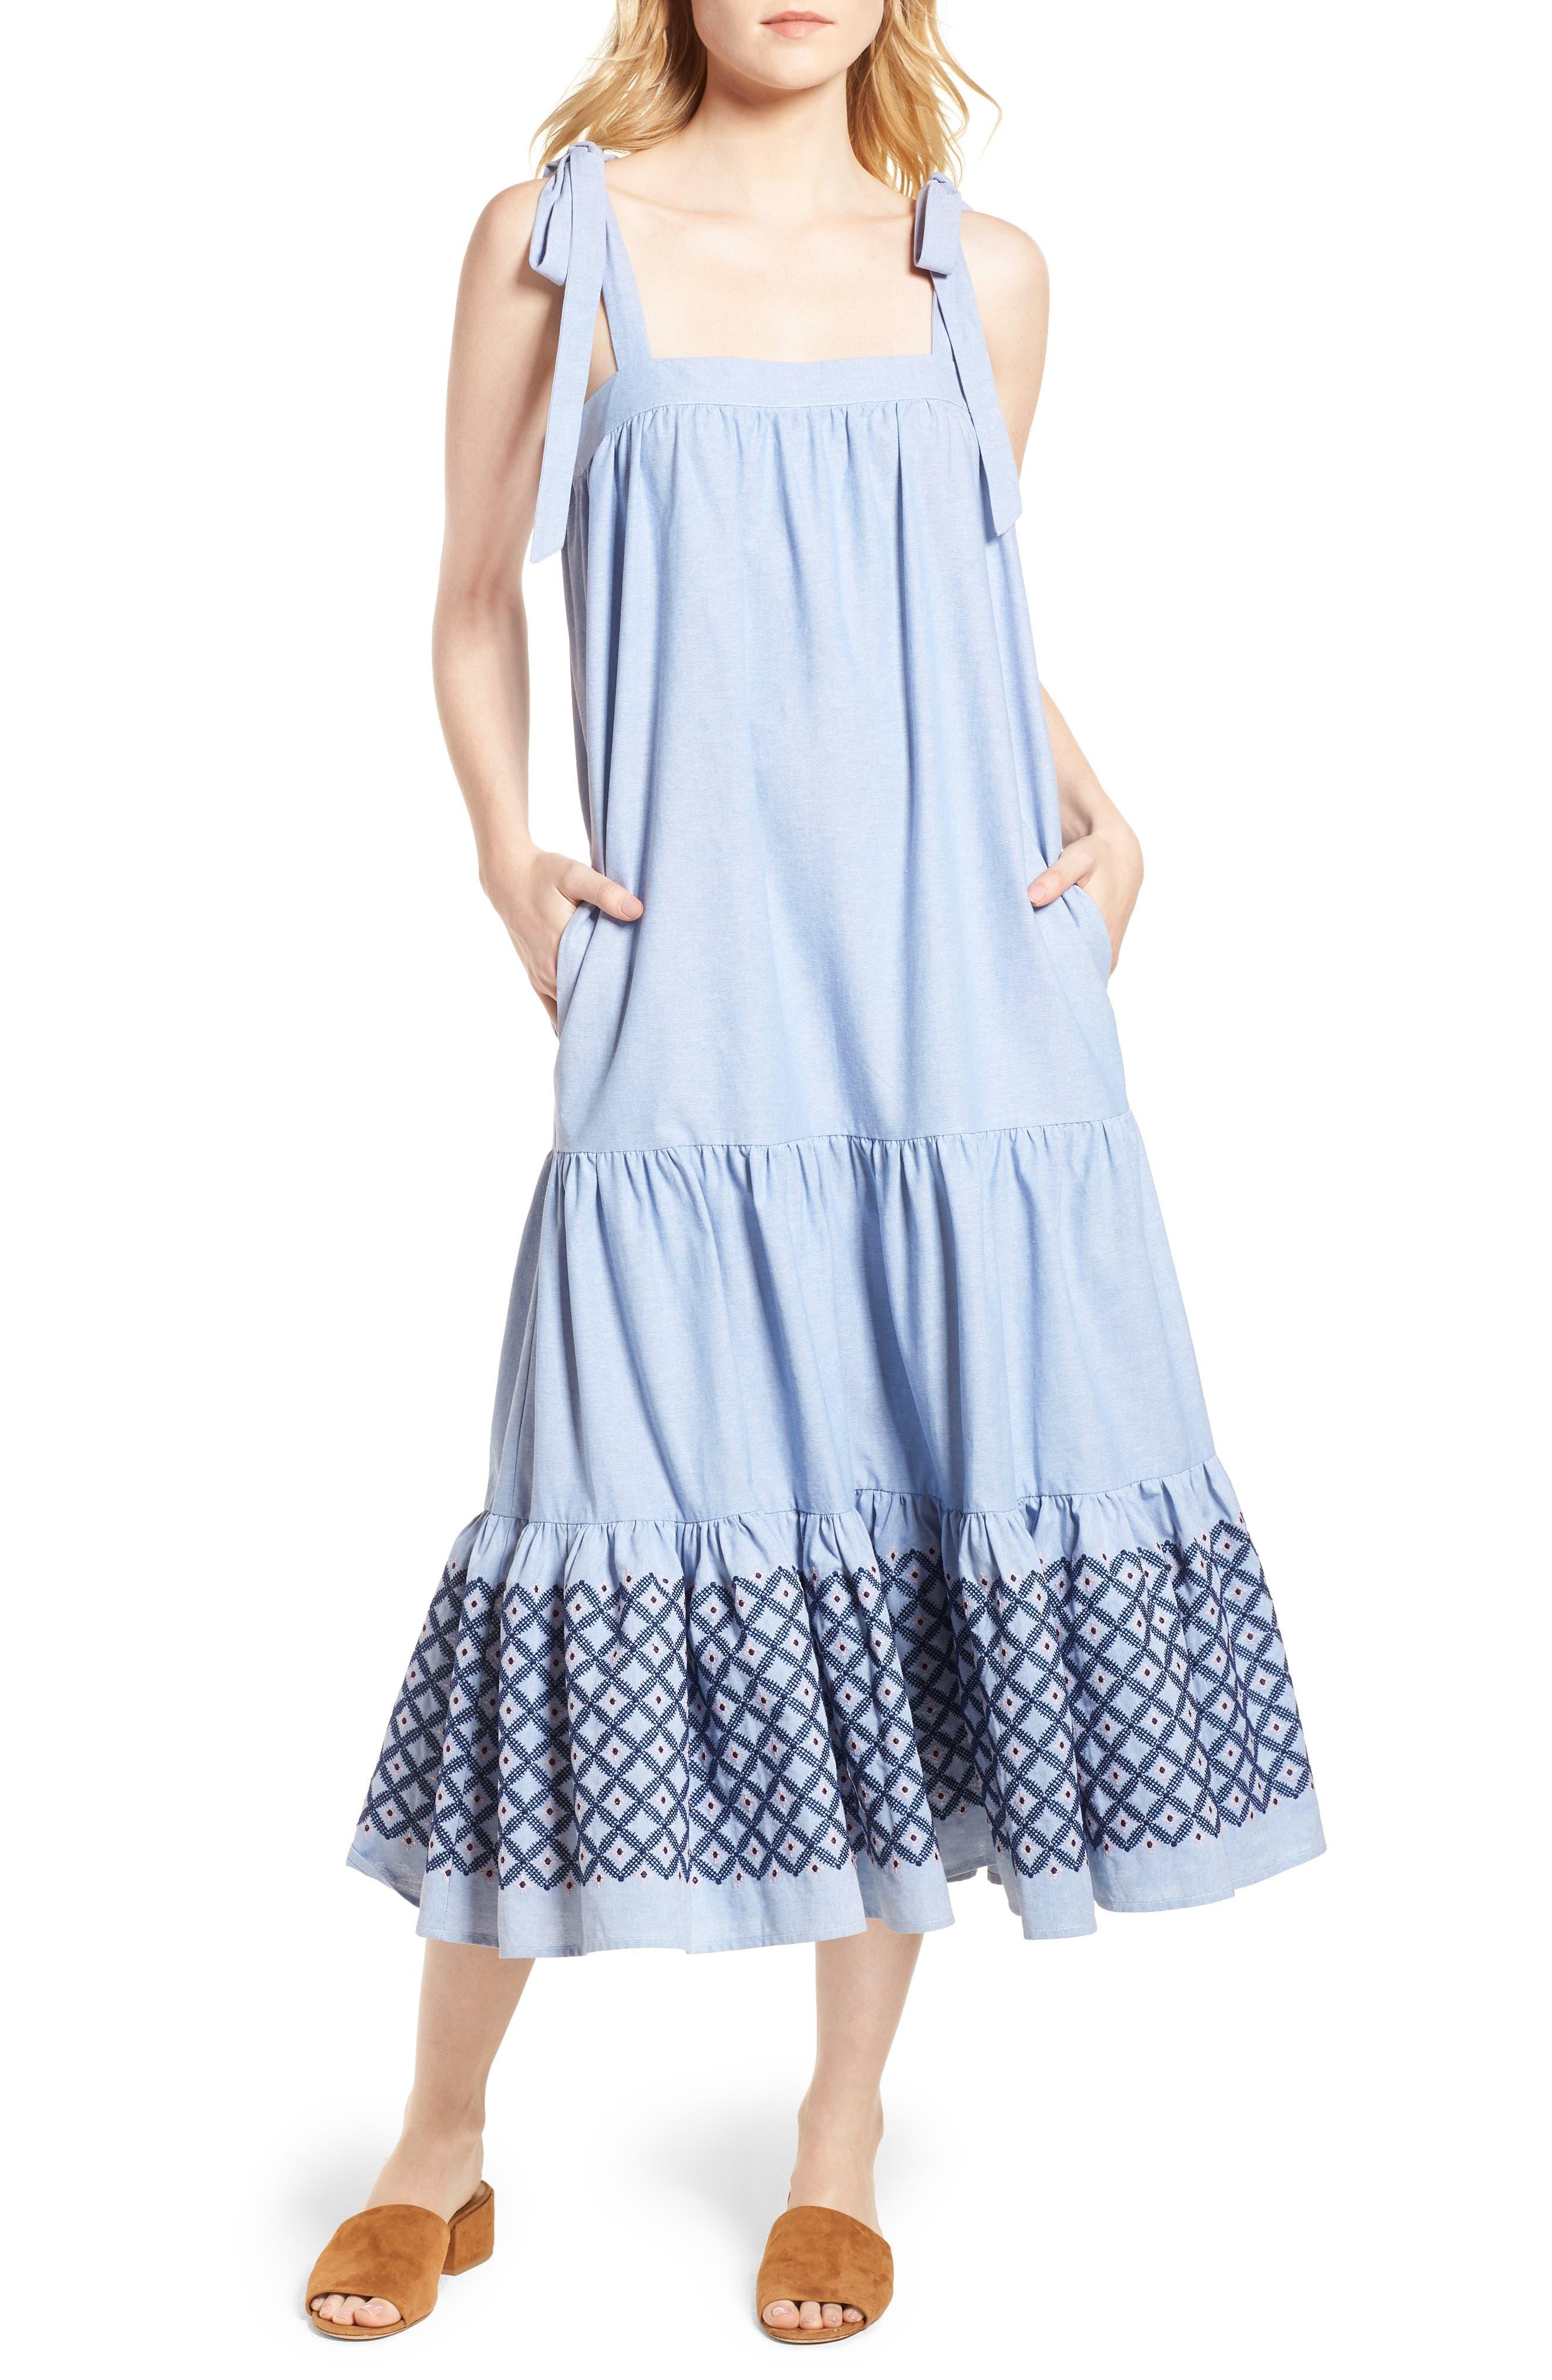 Lucy Dress,                             Main thumbnail 1, color,                             Blue